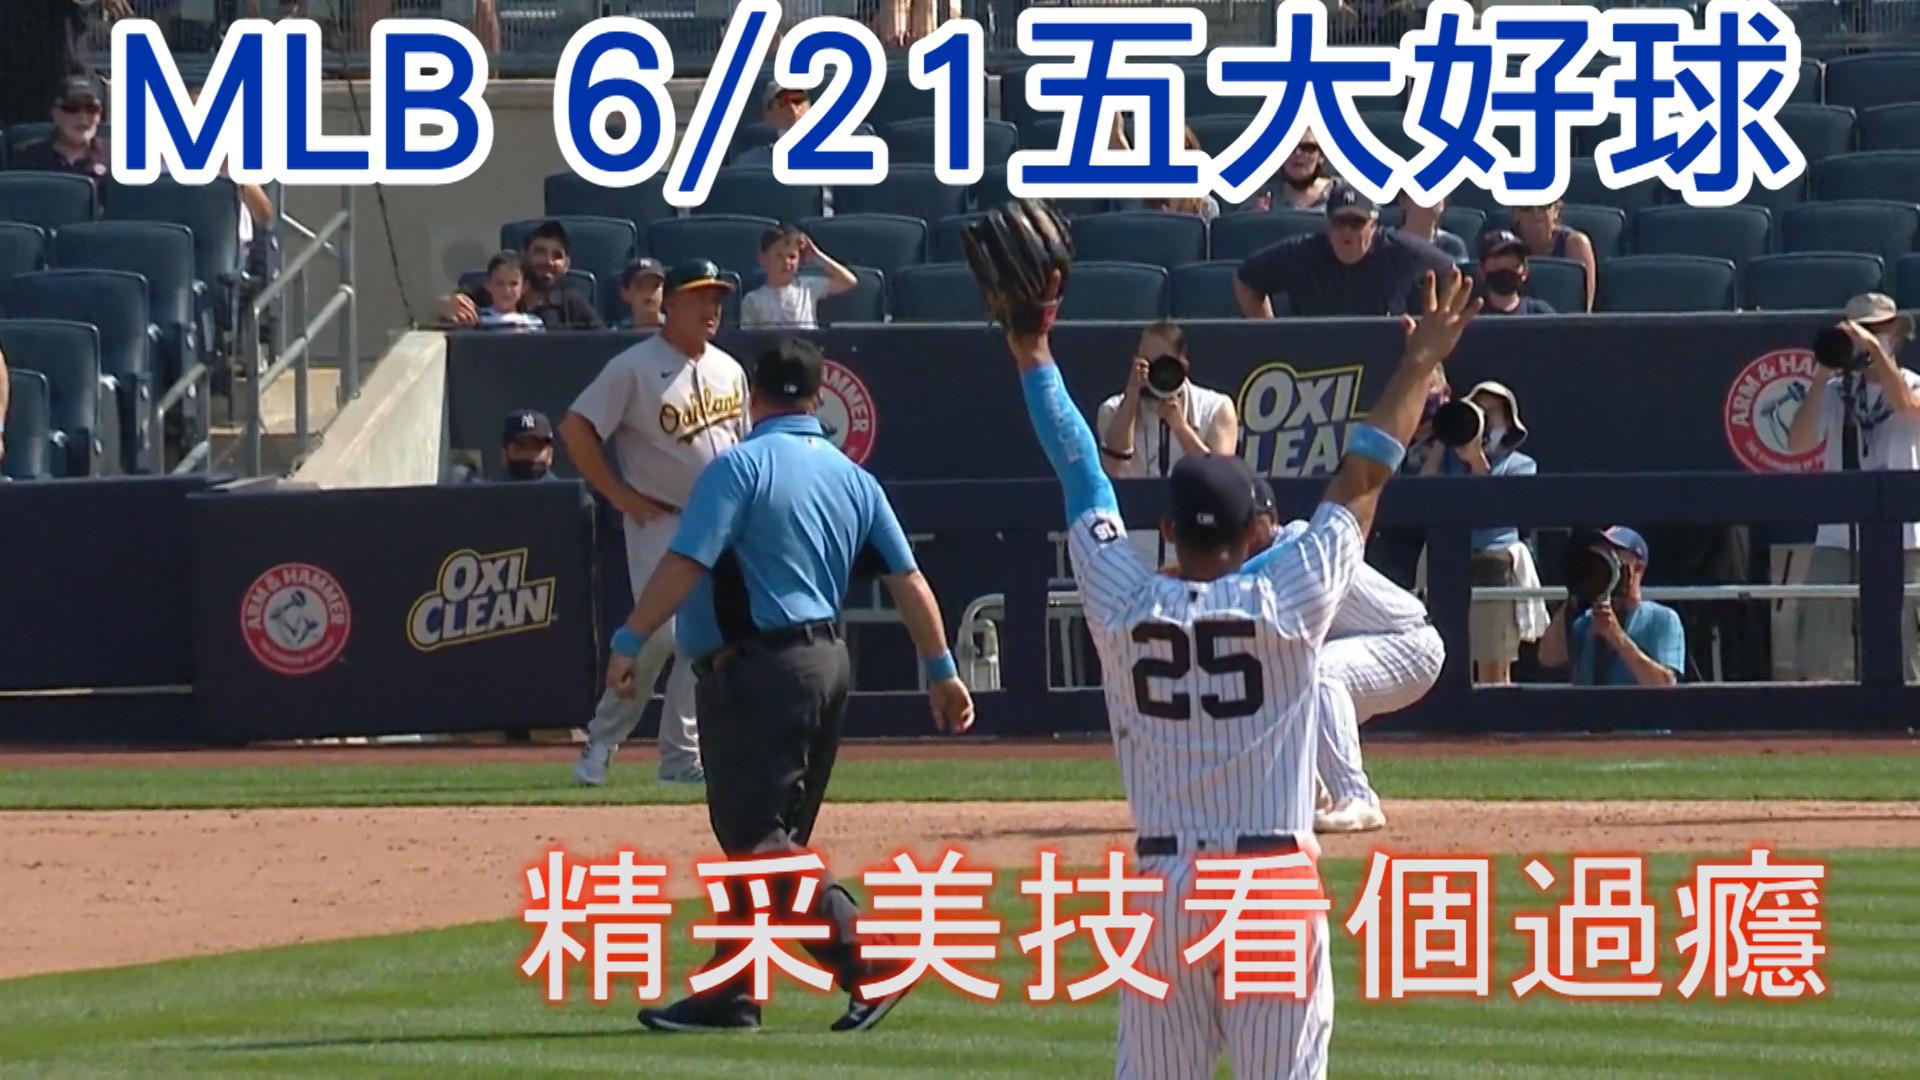 【MLB看愛爾達】MLB本日五大好球 精采美技拍案叫絕 06/21